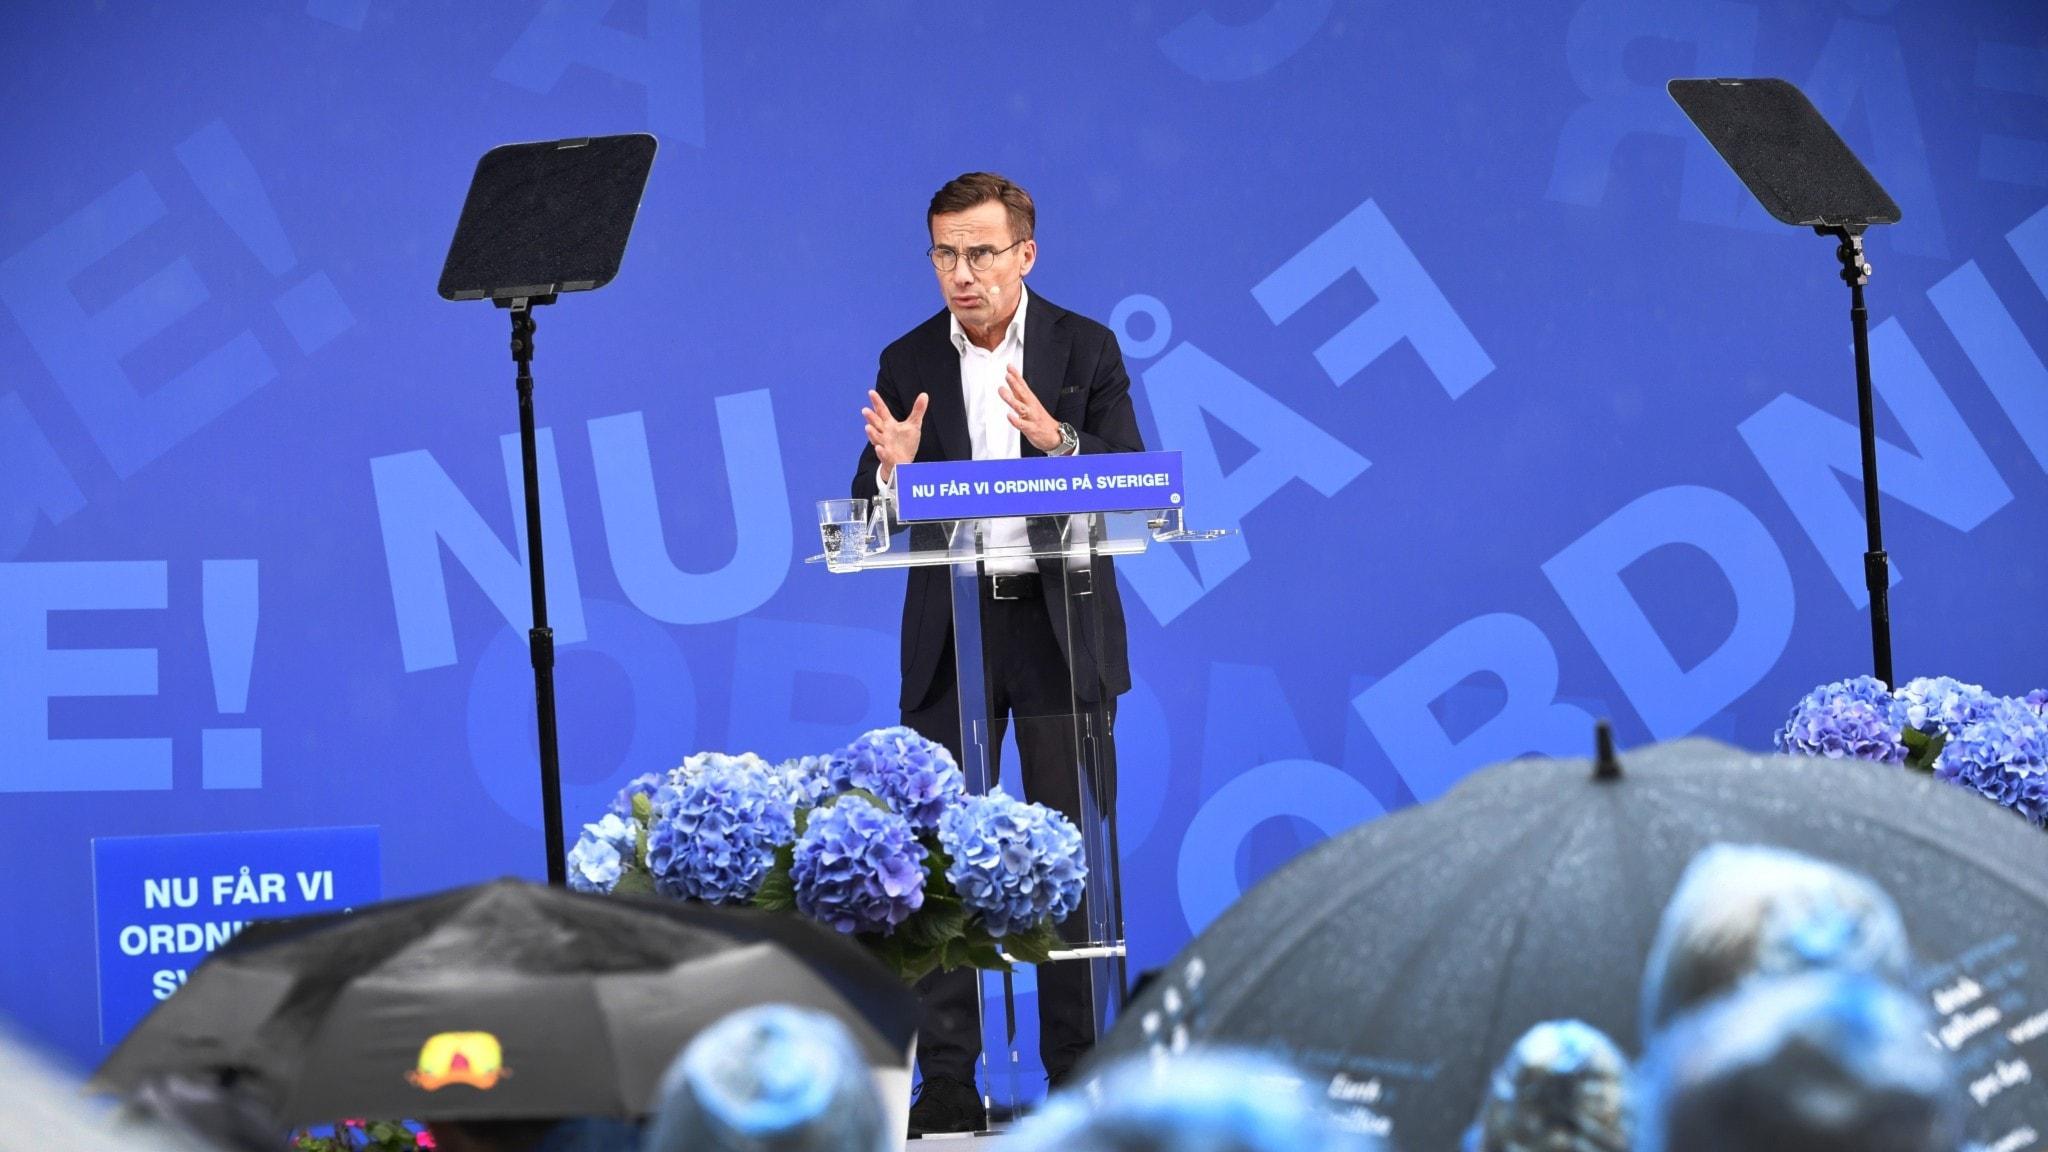 Moderaternas partiledare Ulf Kristersson håller tal.